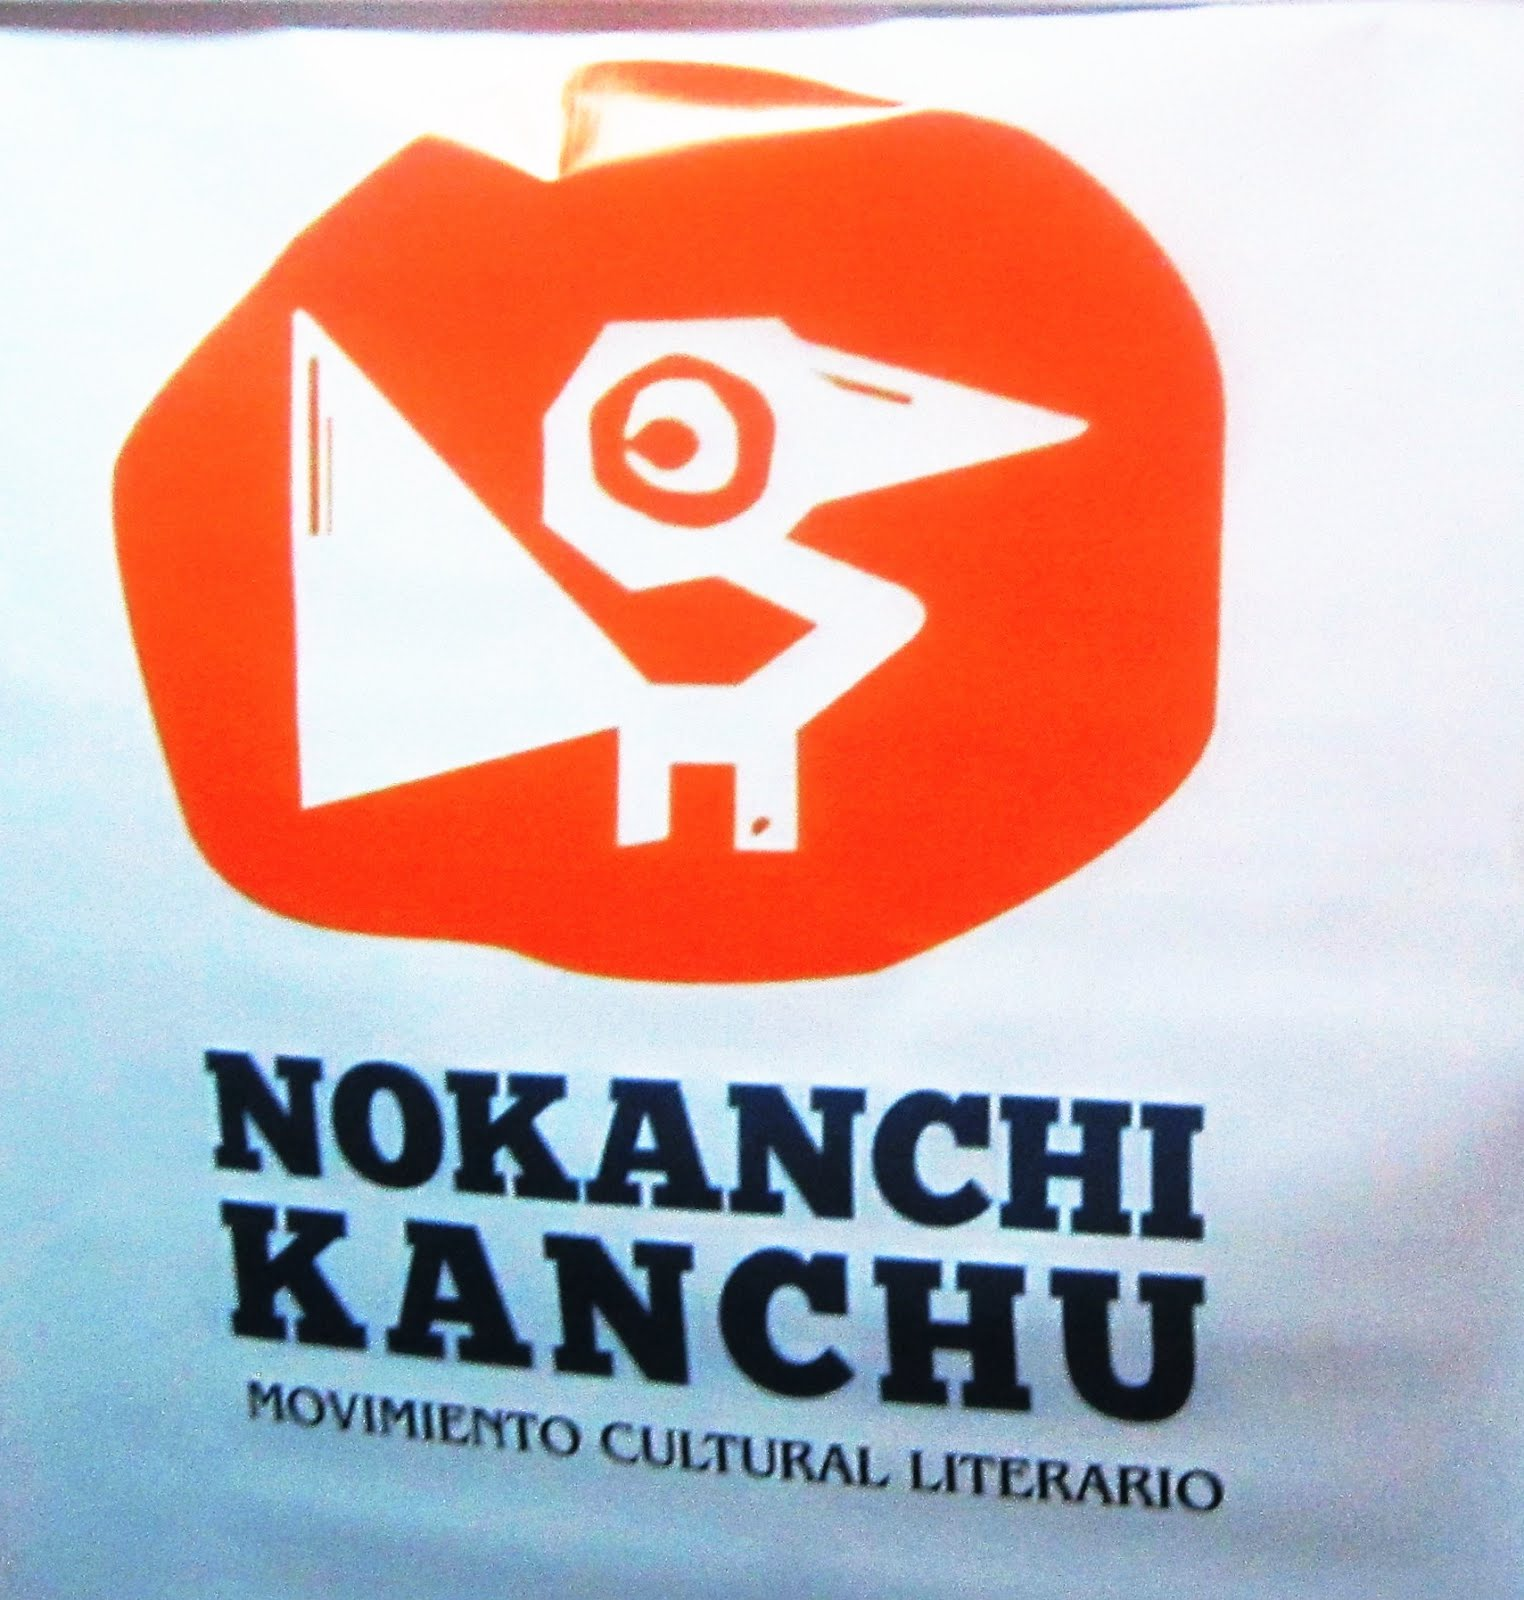 SJL: Movimiento Cultural Nokanchi Kanchu